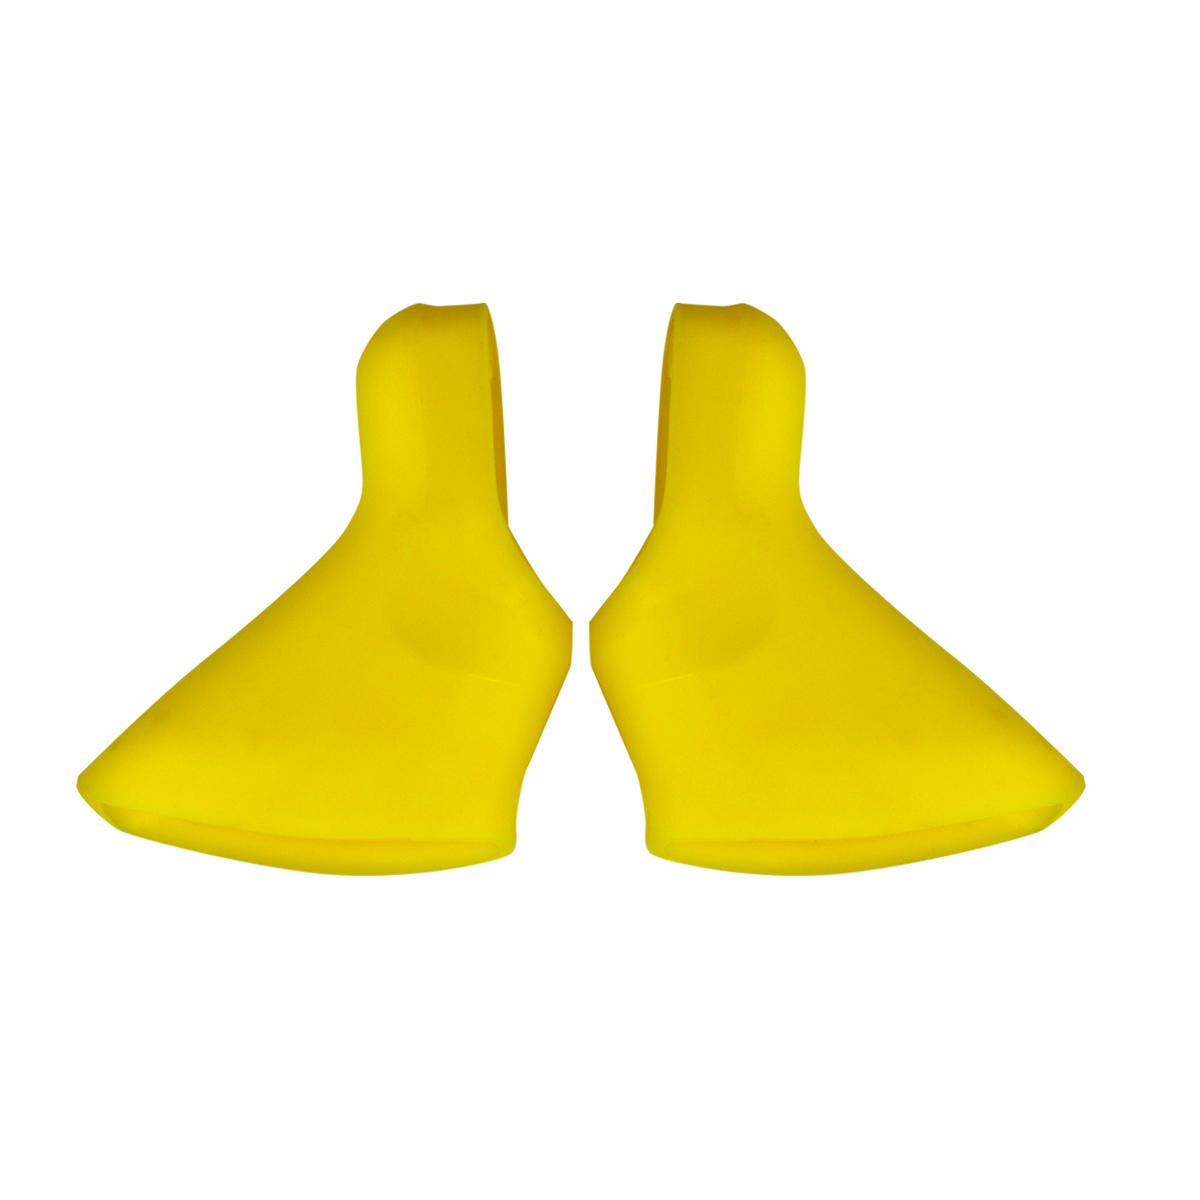 Couvre cocottes Far & Near SRAM jaune